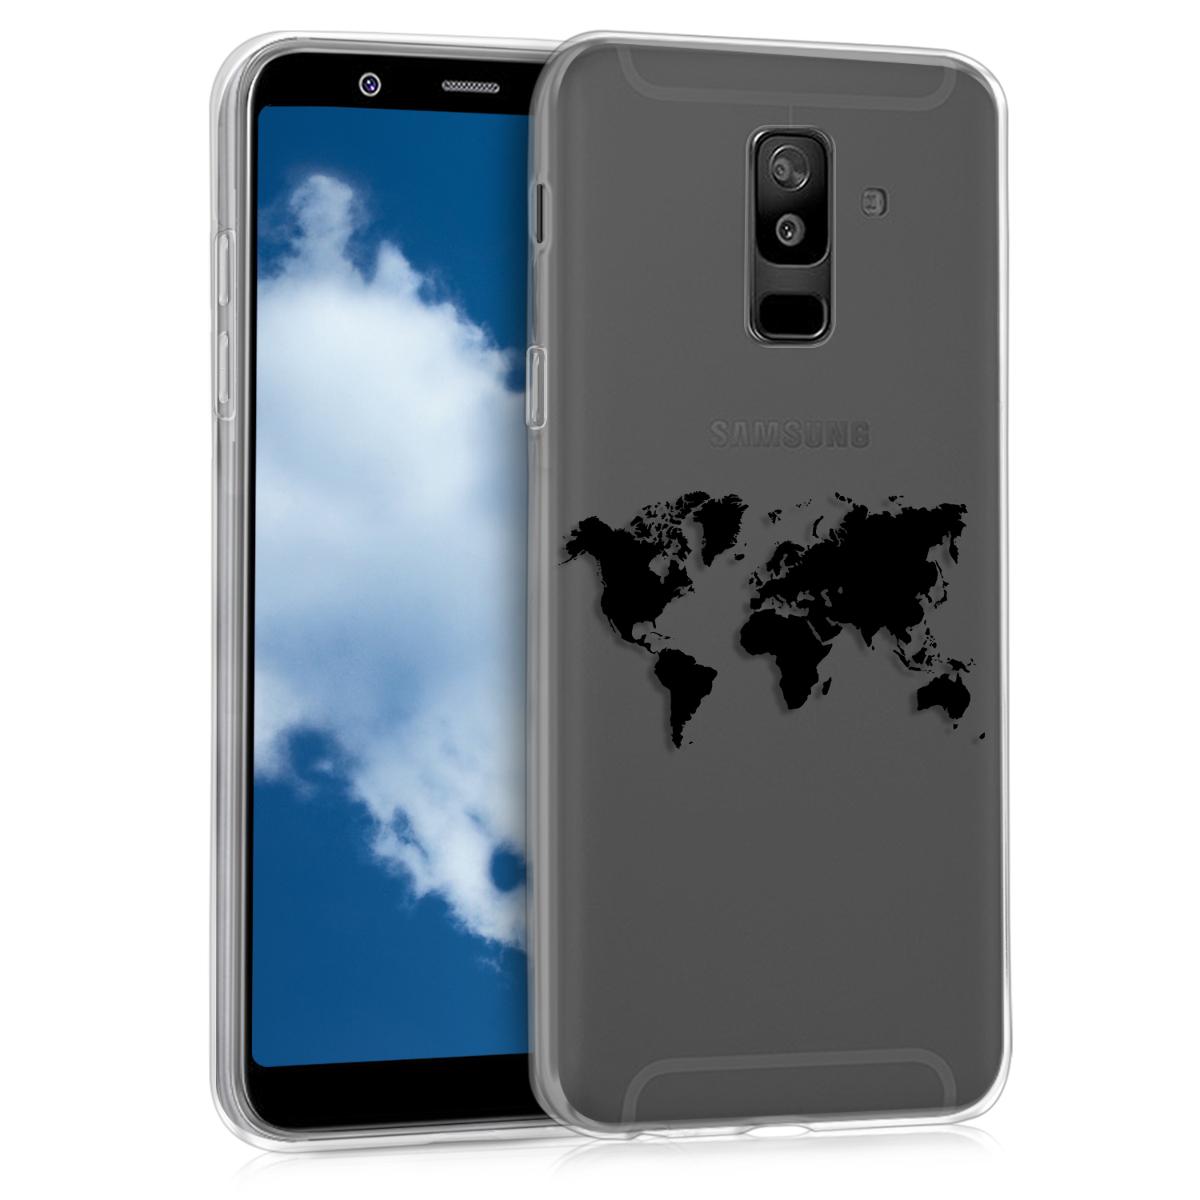 KW Θήκη Σιλικόνης Samsung Galaxy A6 Plus 2018 - Black / Transparent (45261.02)